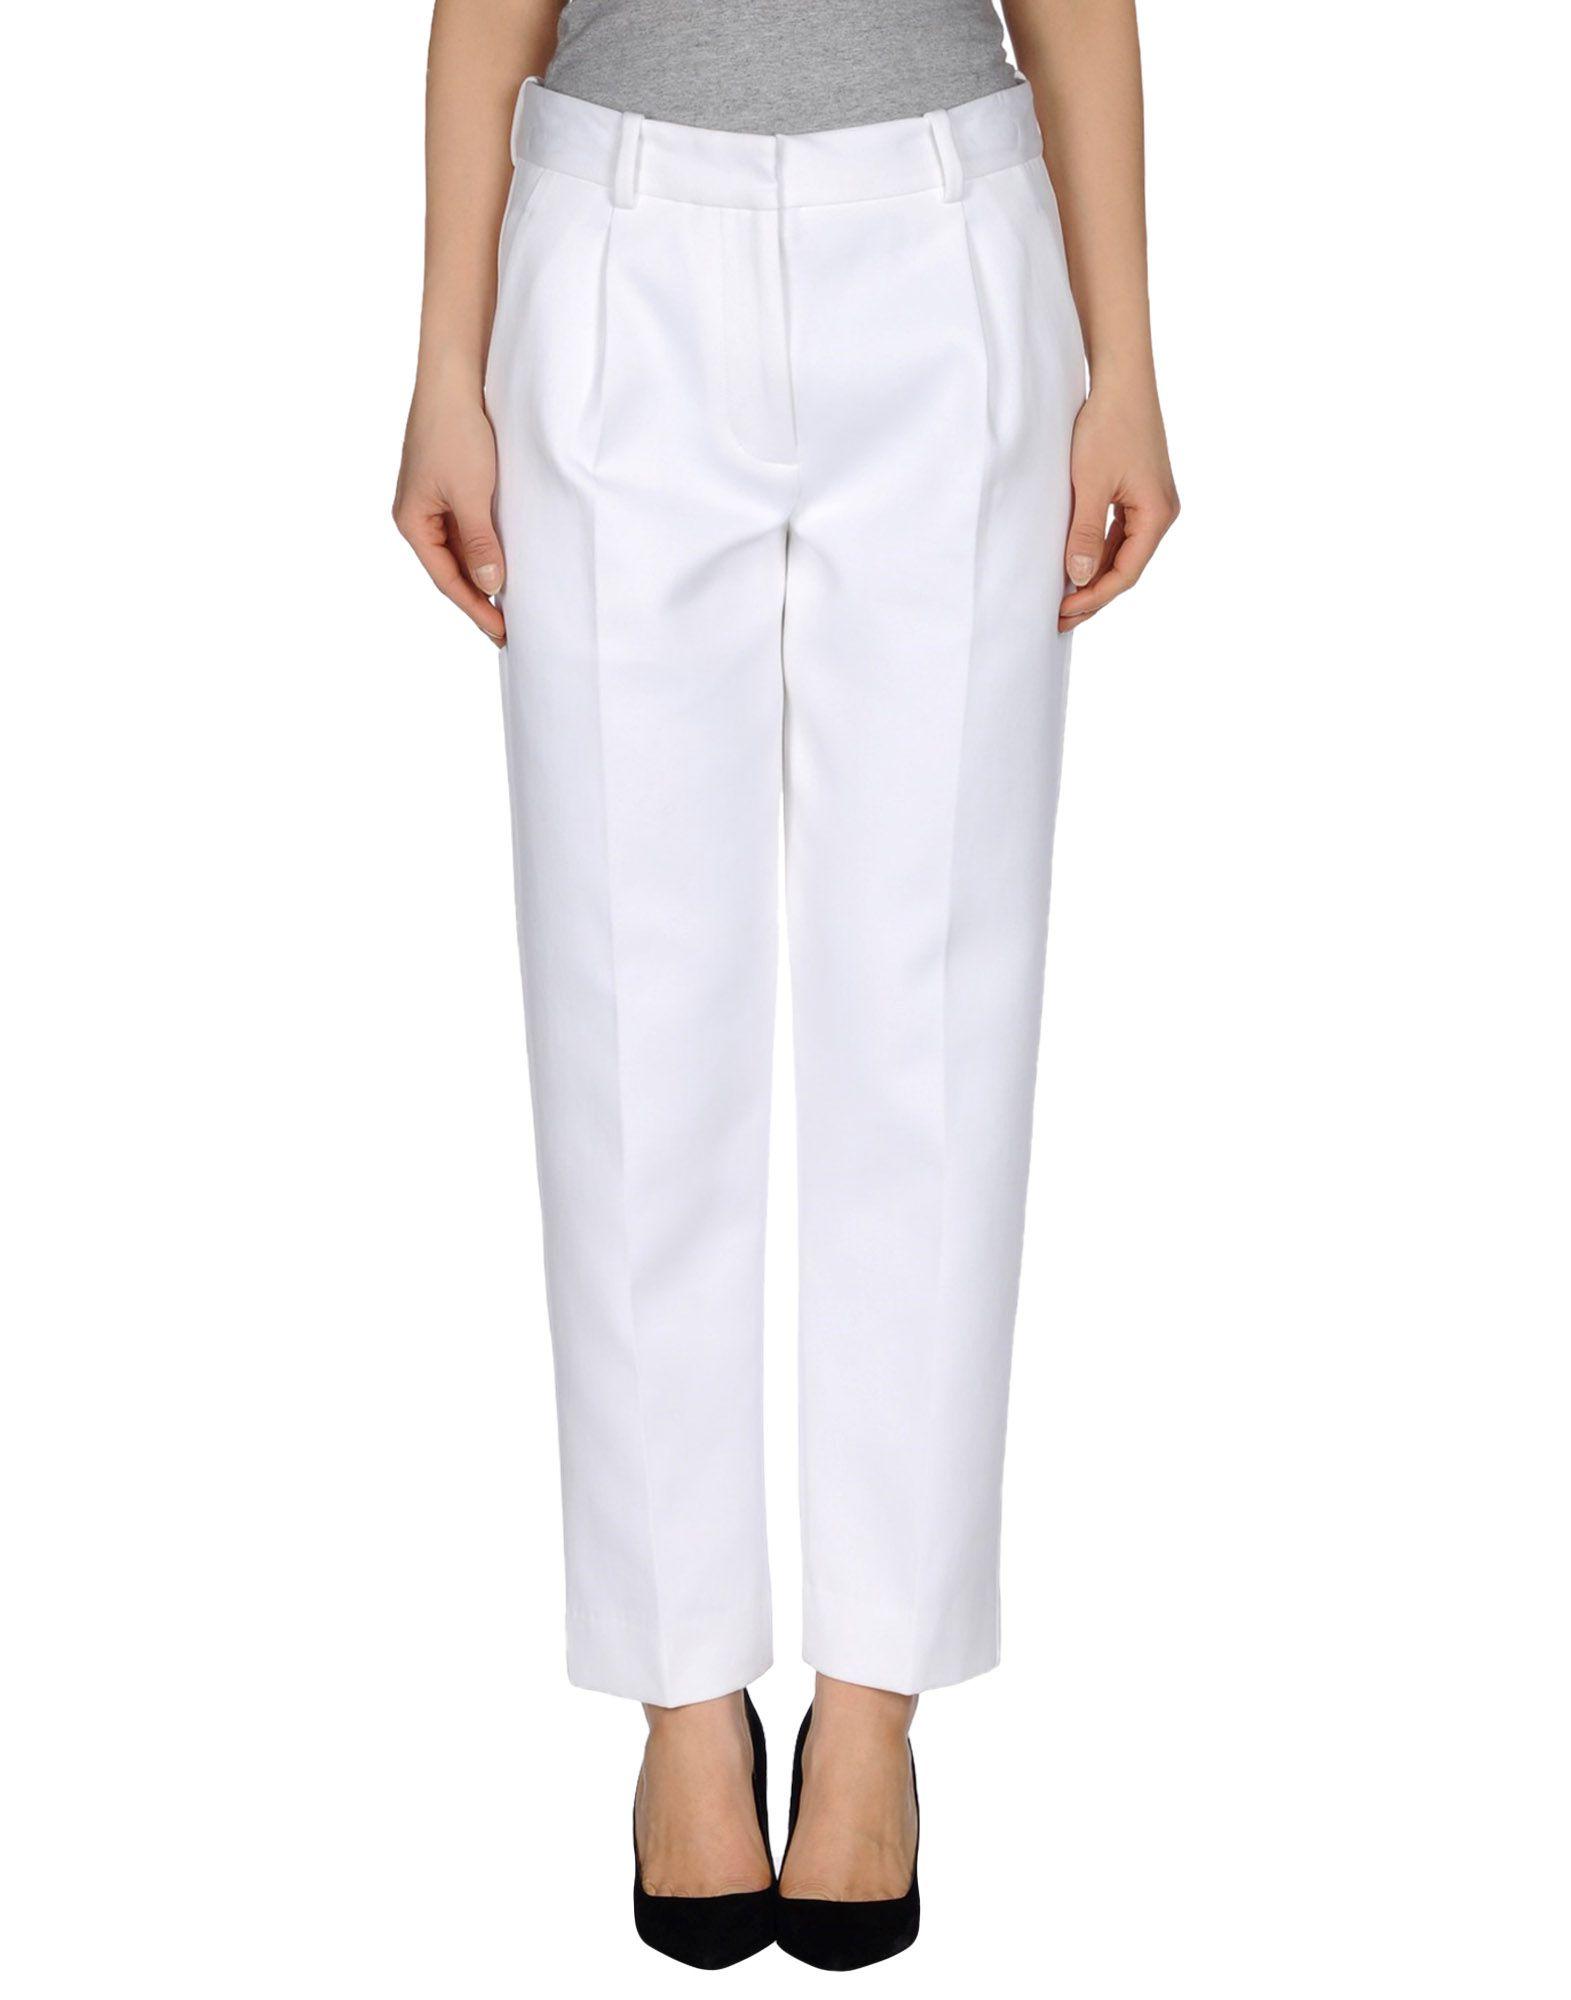 Pantalone 3.1 Phillip Lim Donna - Acquista online su b151PTa